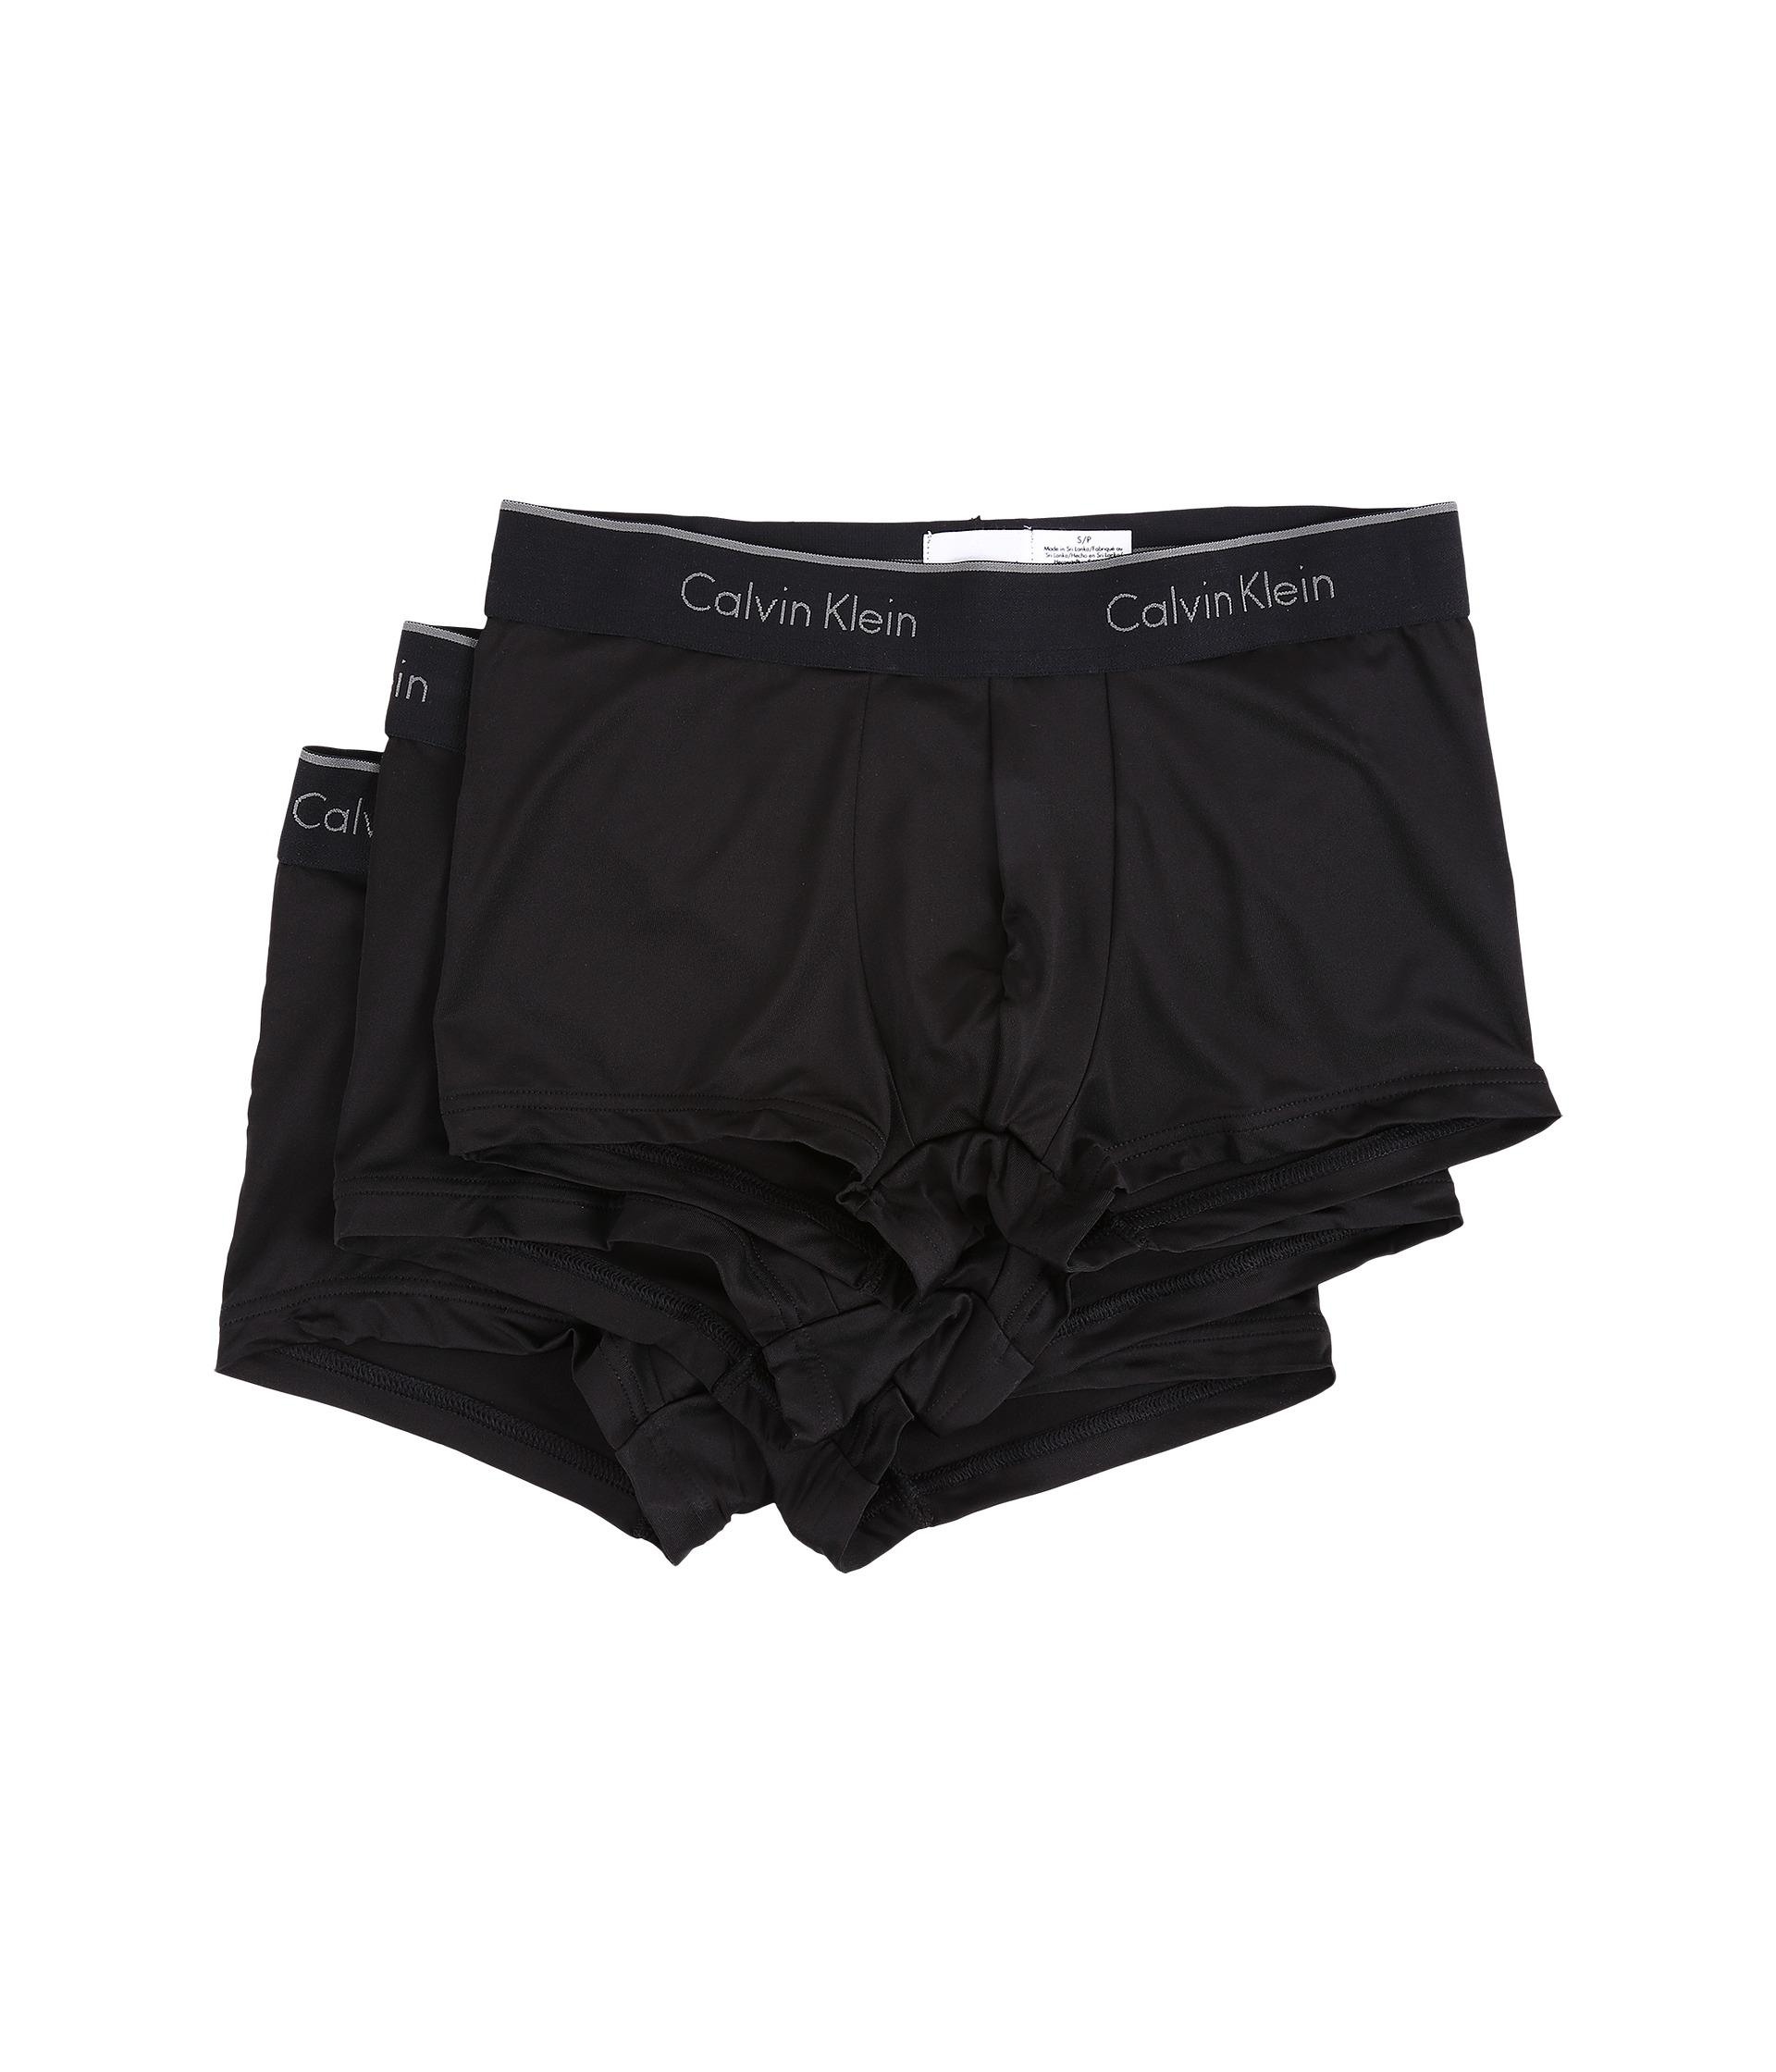 calvin klein underwear micro stretch 3 pack low rise trunk. Black Bedroom Furniture Sets. Home Design Ideas